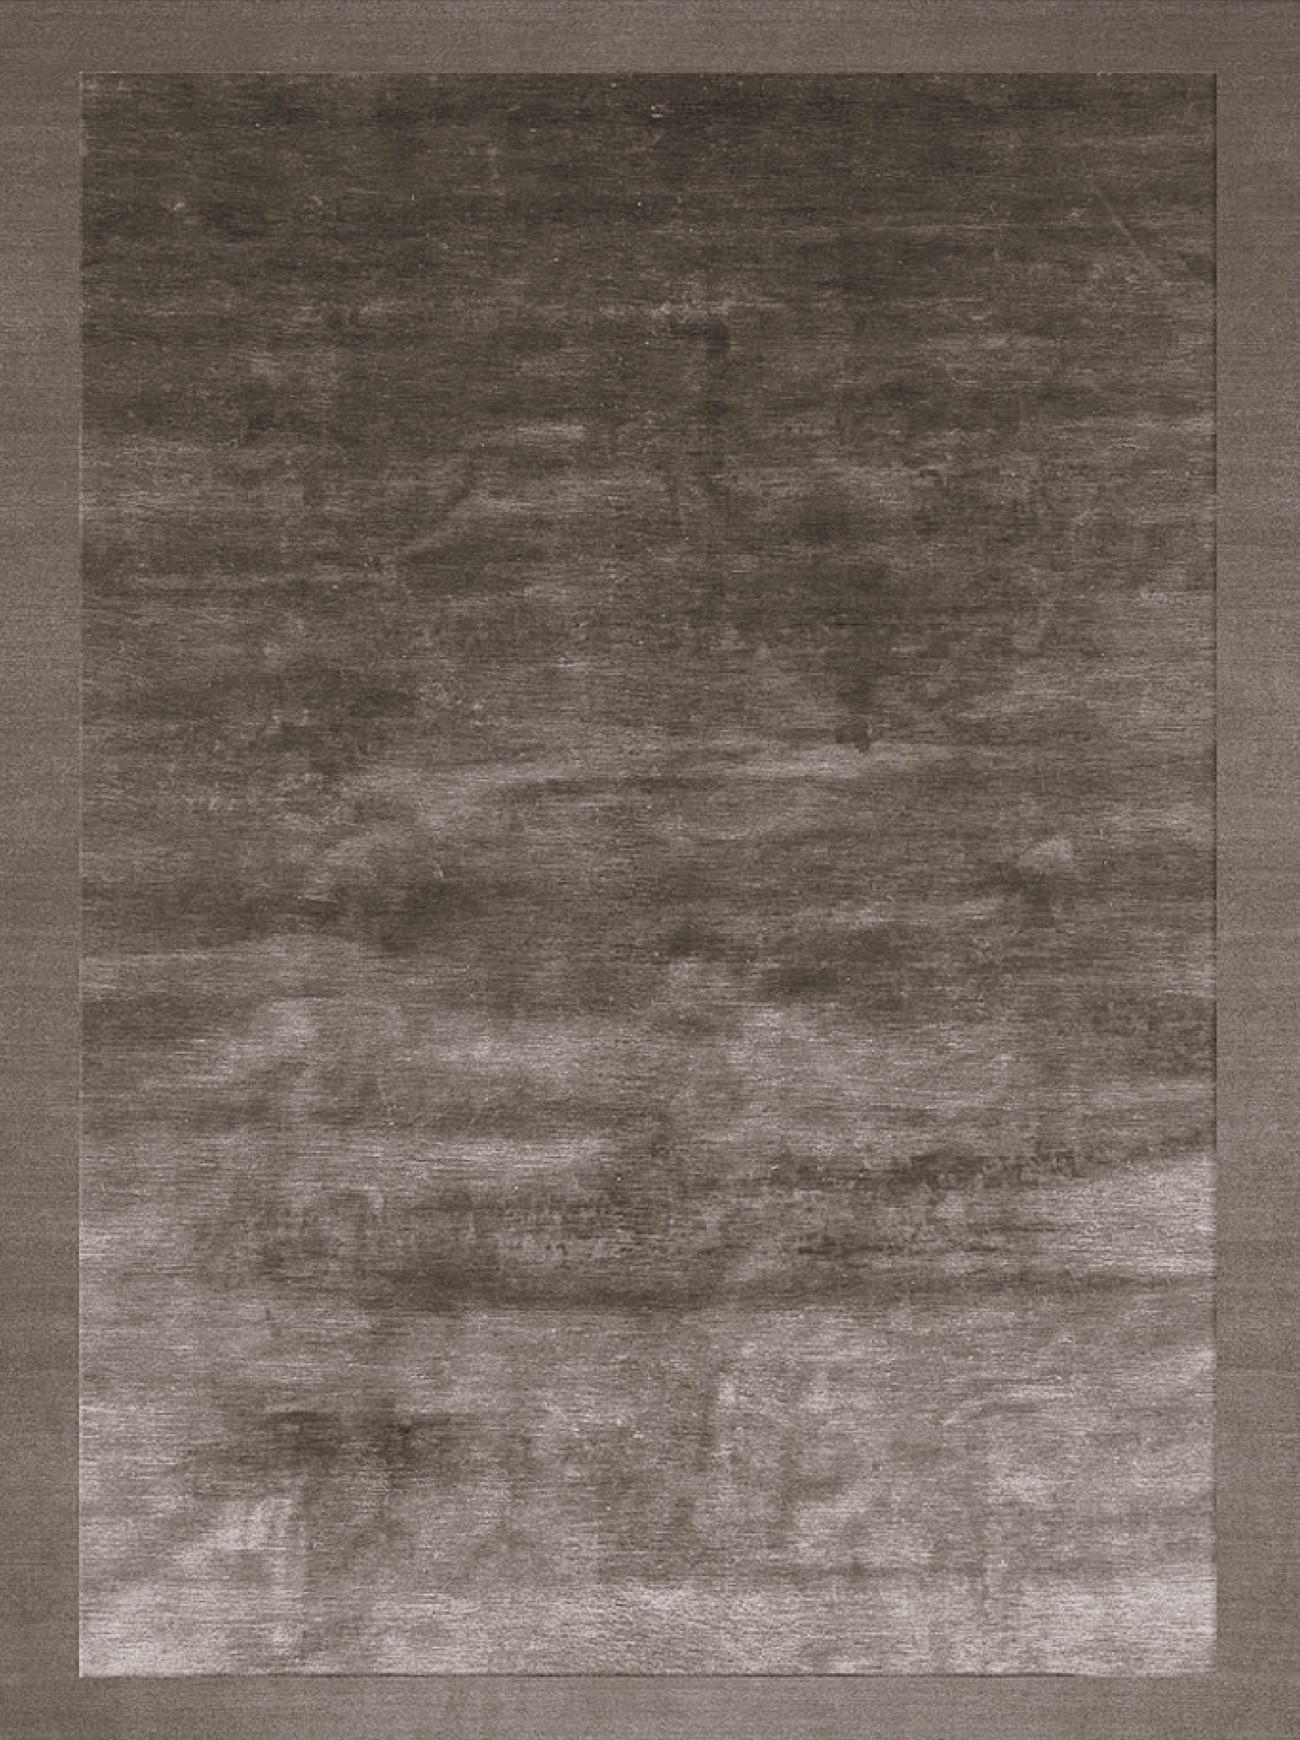 Poliform_tappeti_FRAME_01_finiture_1300x1740px_Grey